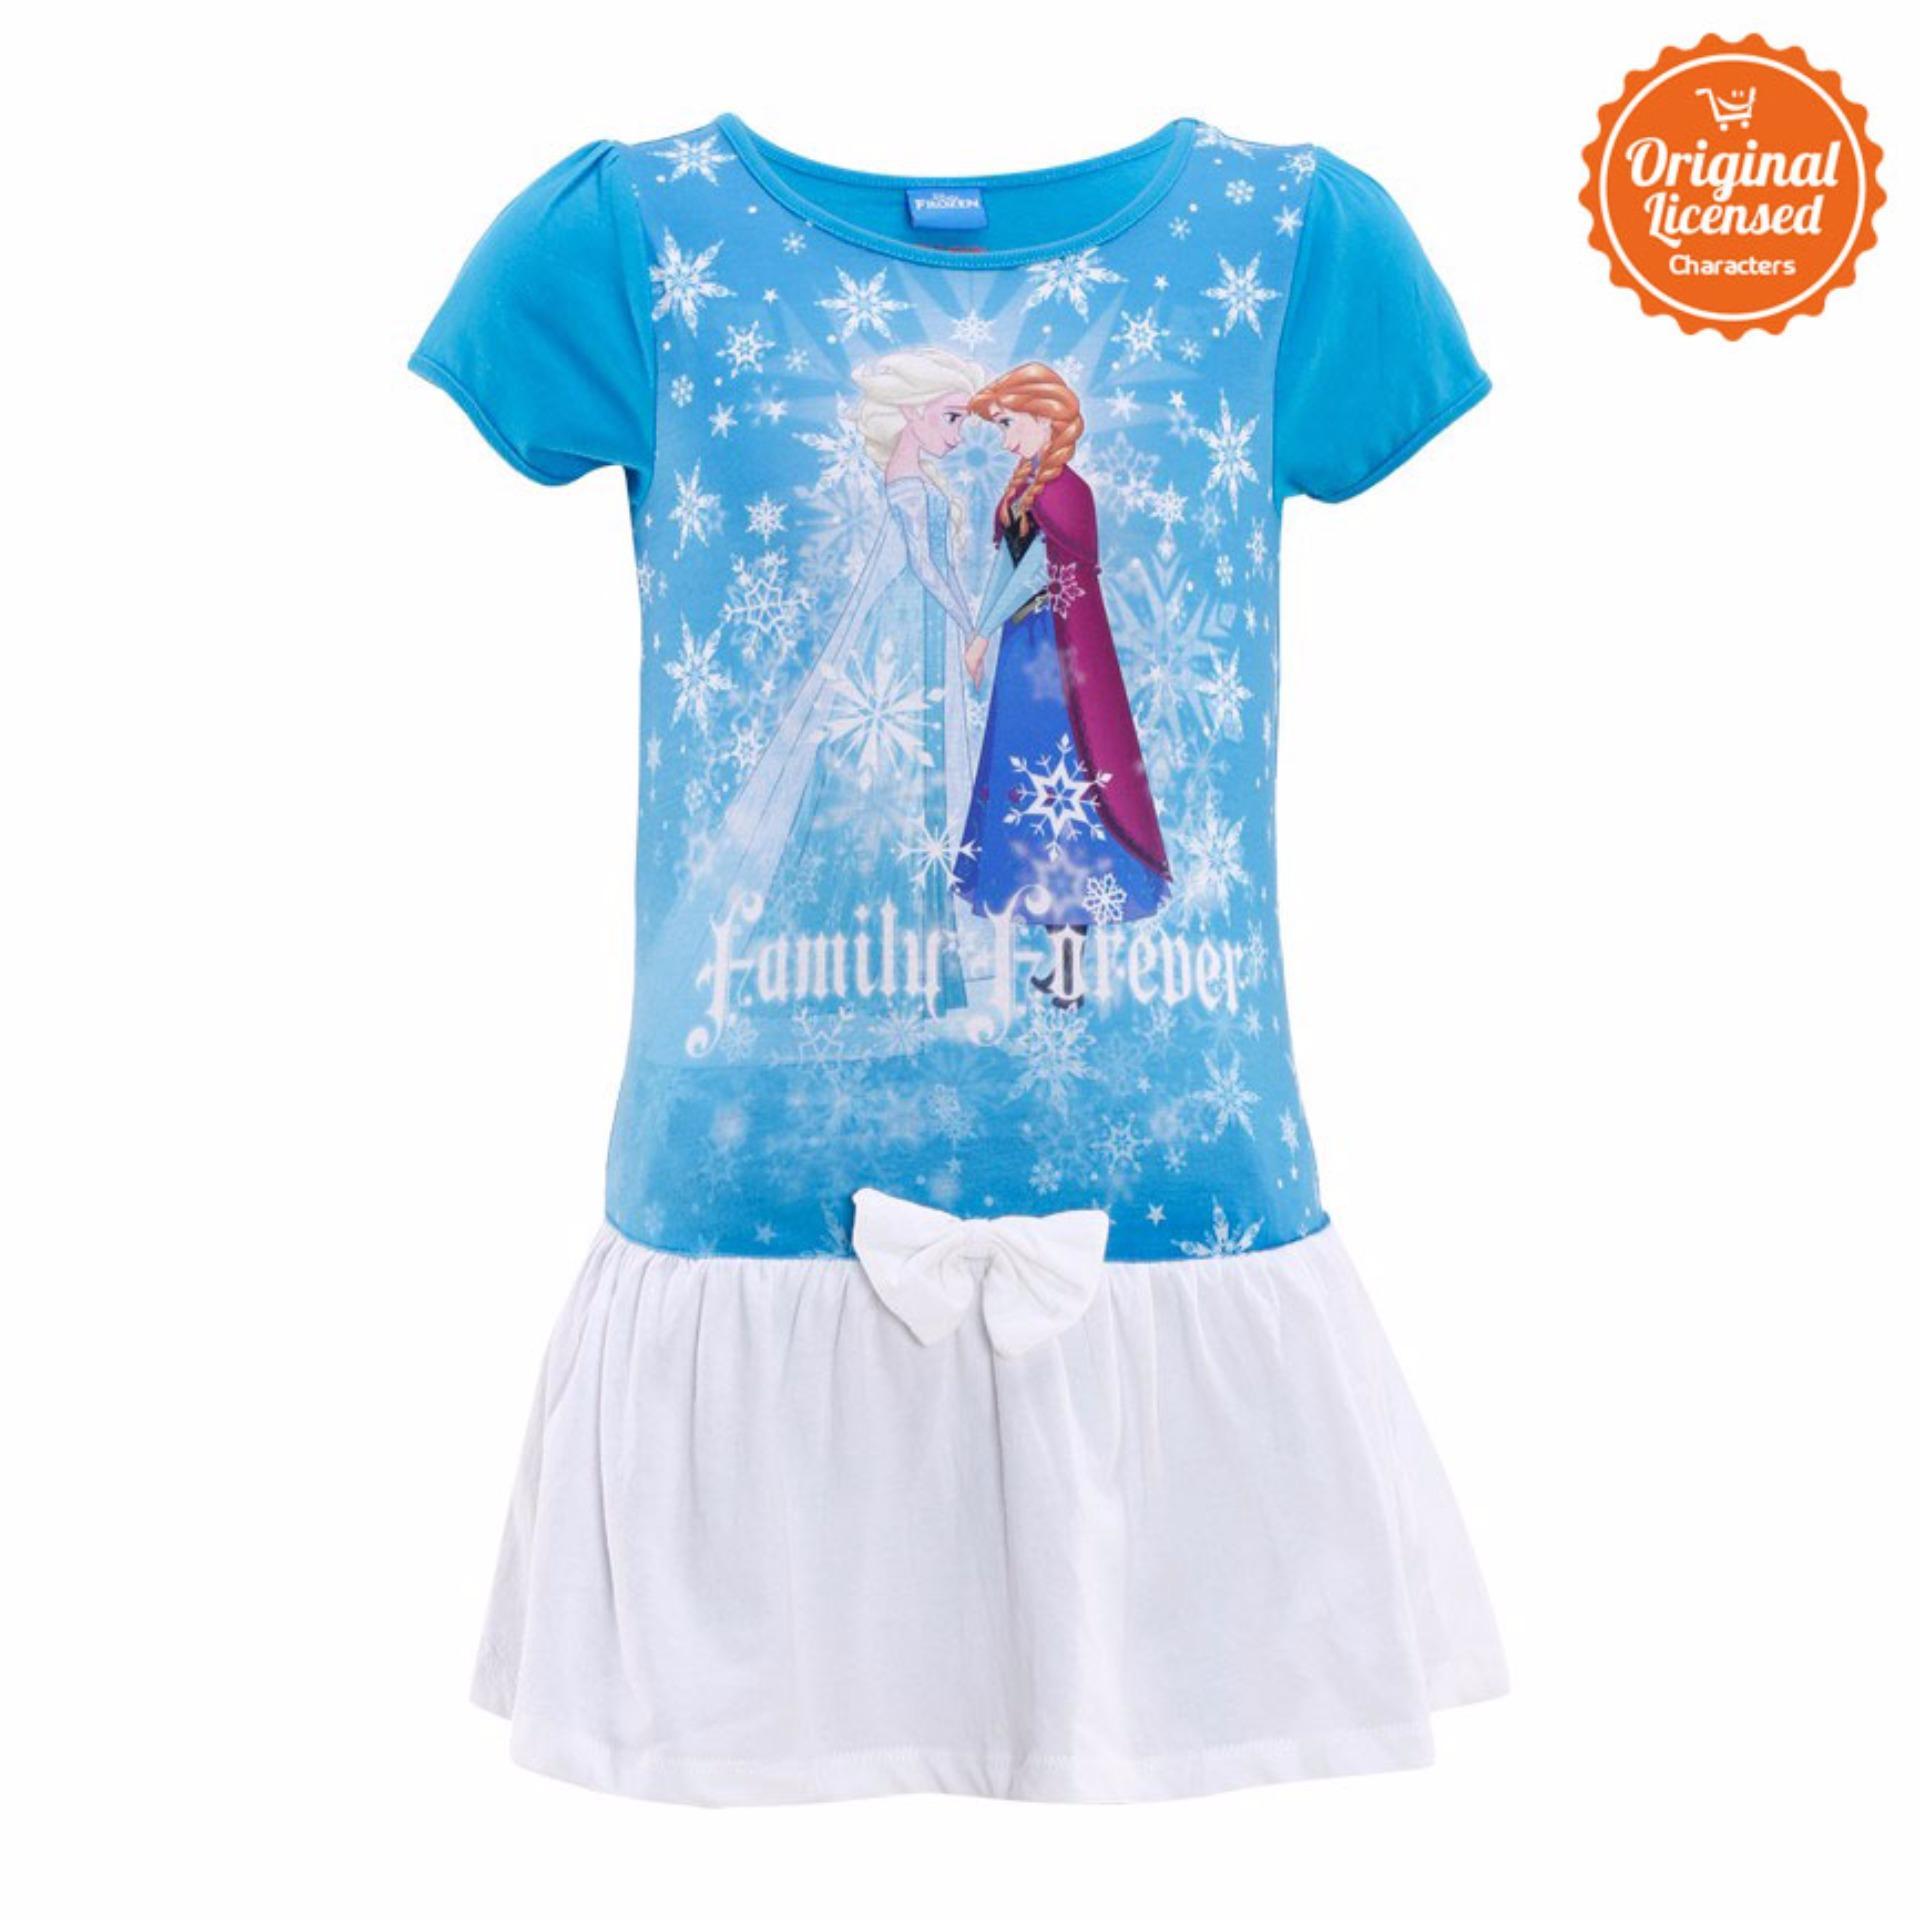 Kaos Pandir Finding Nemo Ajs64 Putih Daftar Harga Terkini Dan Paw Patrol Anak Family 056 Source Disney Frozen Forever T Shirt Girl